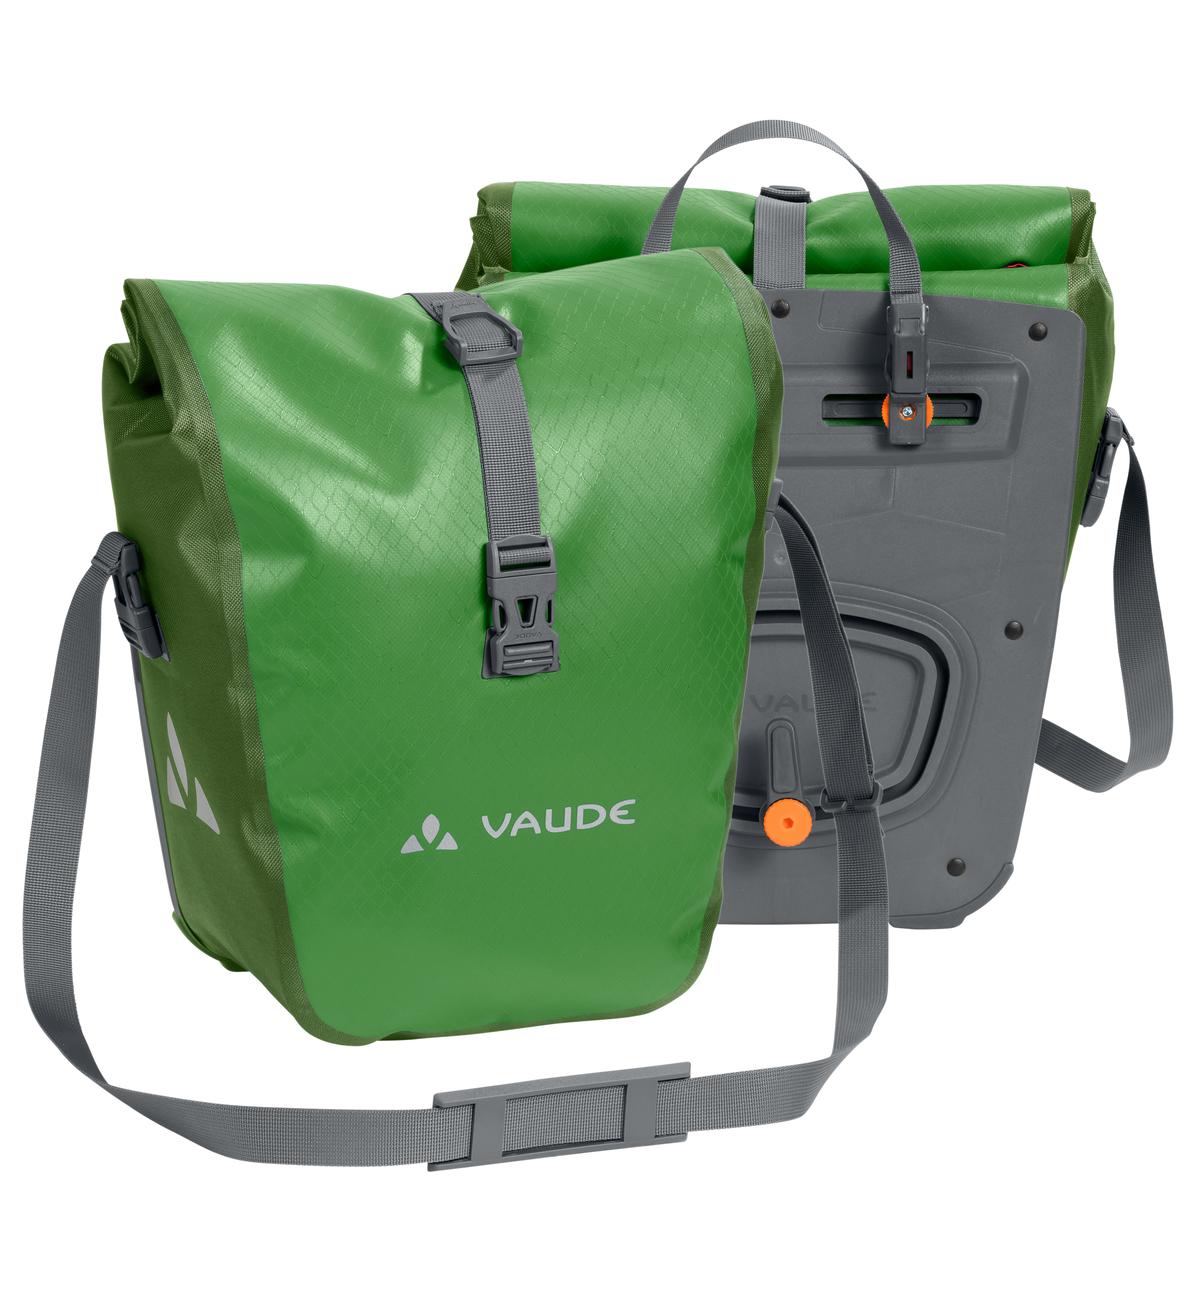 VAUDE Aqua Front parrot green  - 2-Rad-Sport Wehrle